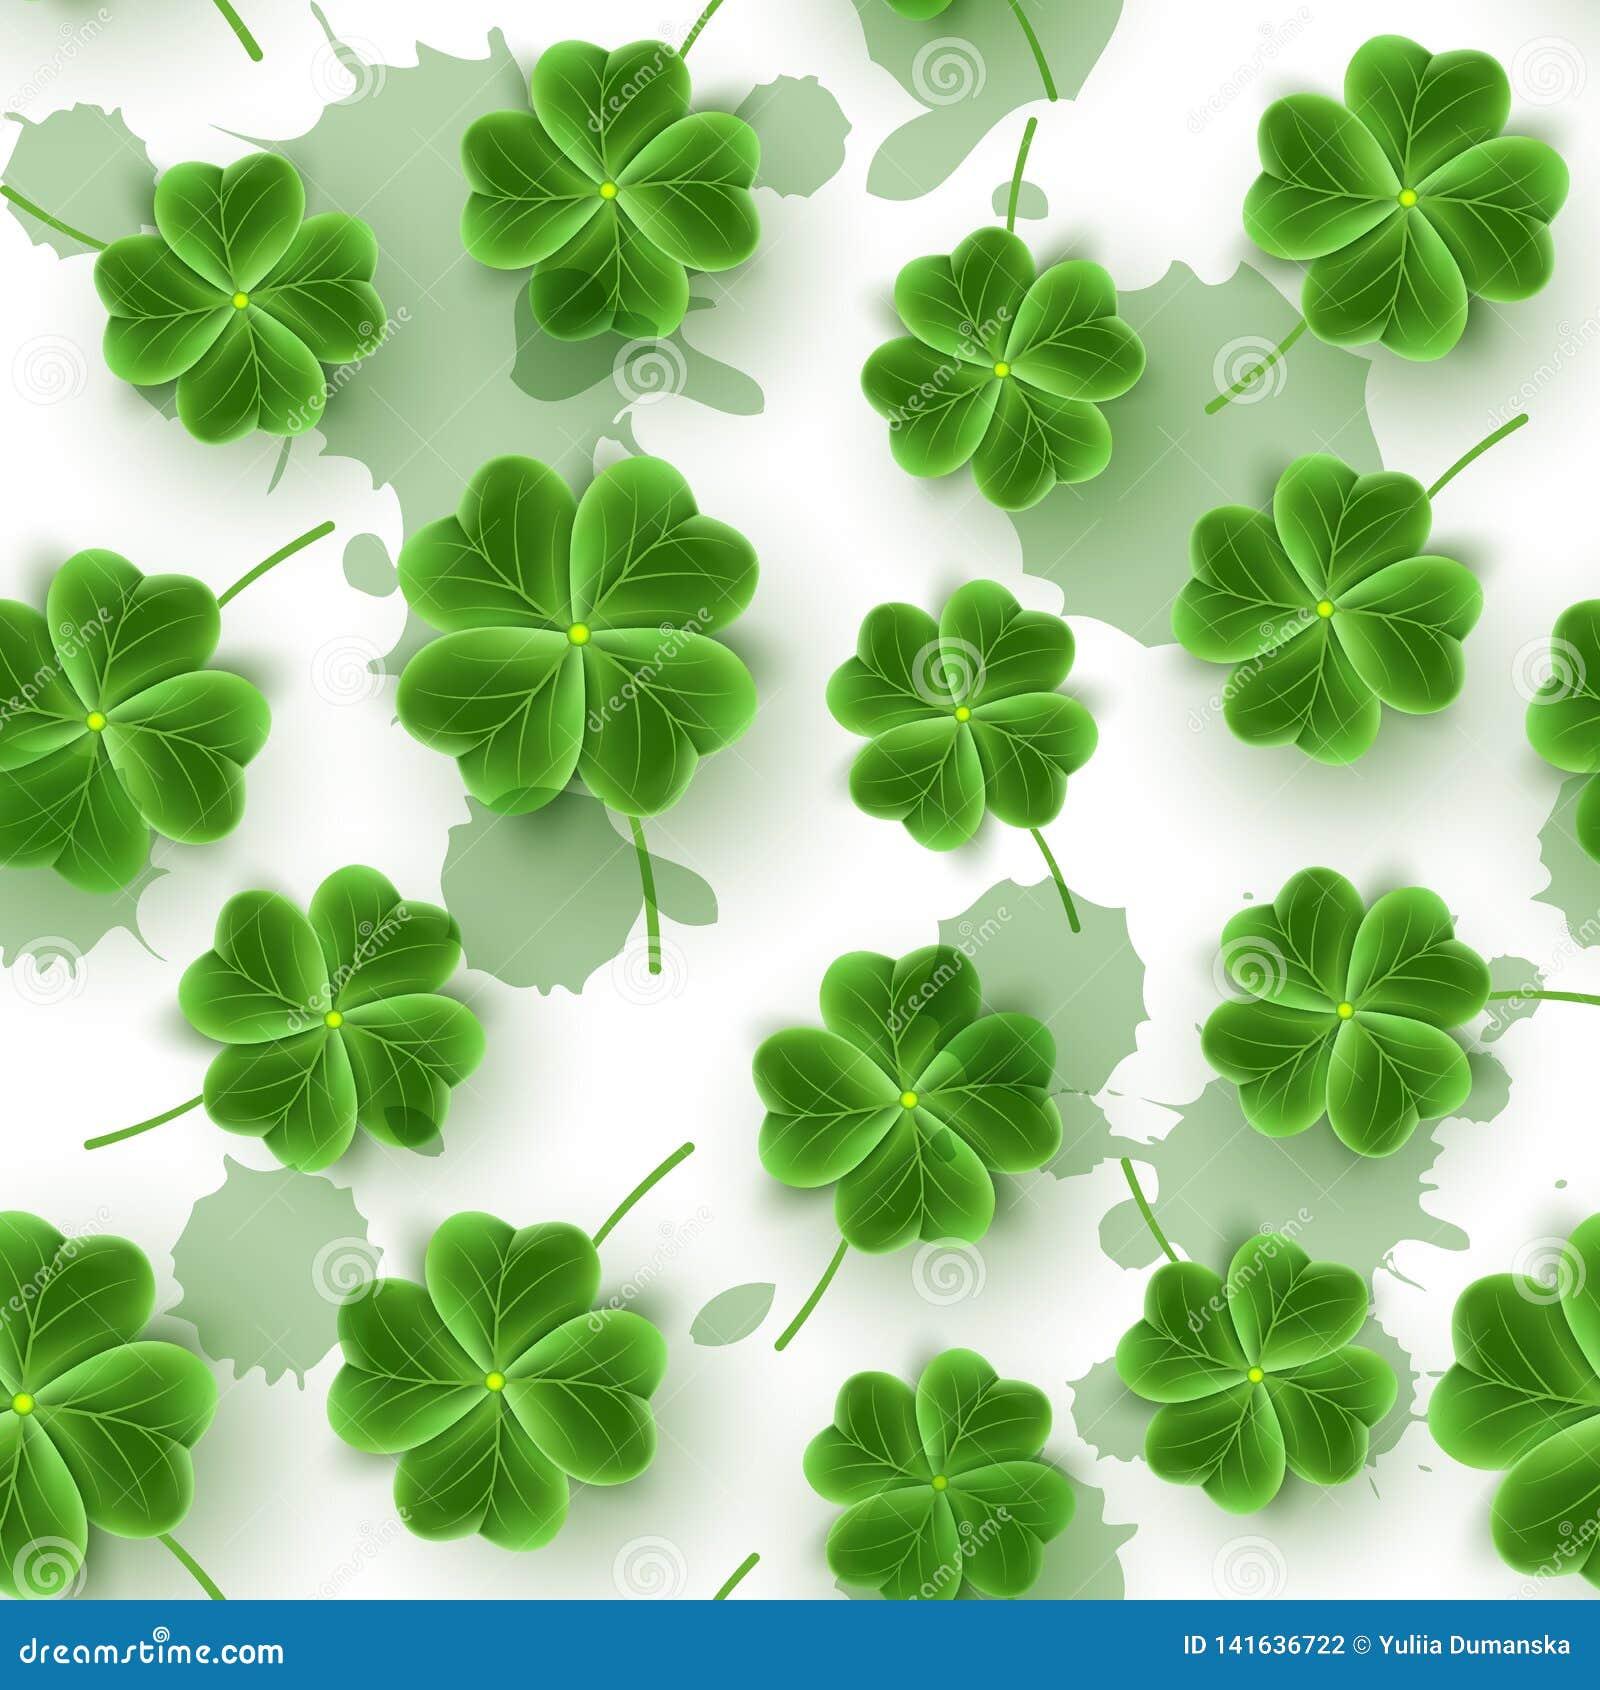 St Patrick`s Day SHAMROCK SHUTTER GLASSES Irish 4 Leaf Clover Saint Green NEW UK